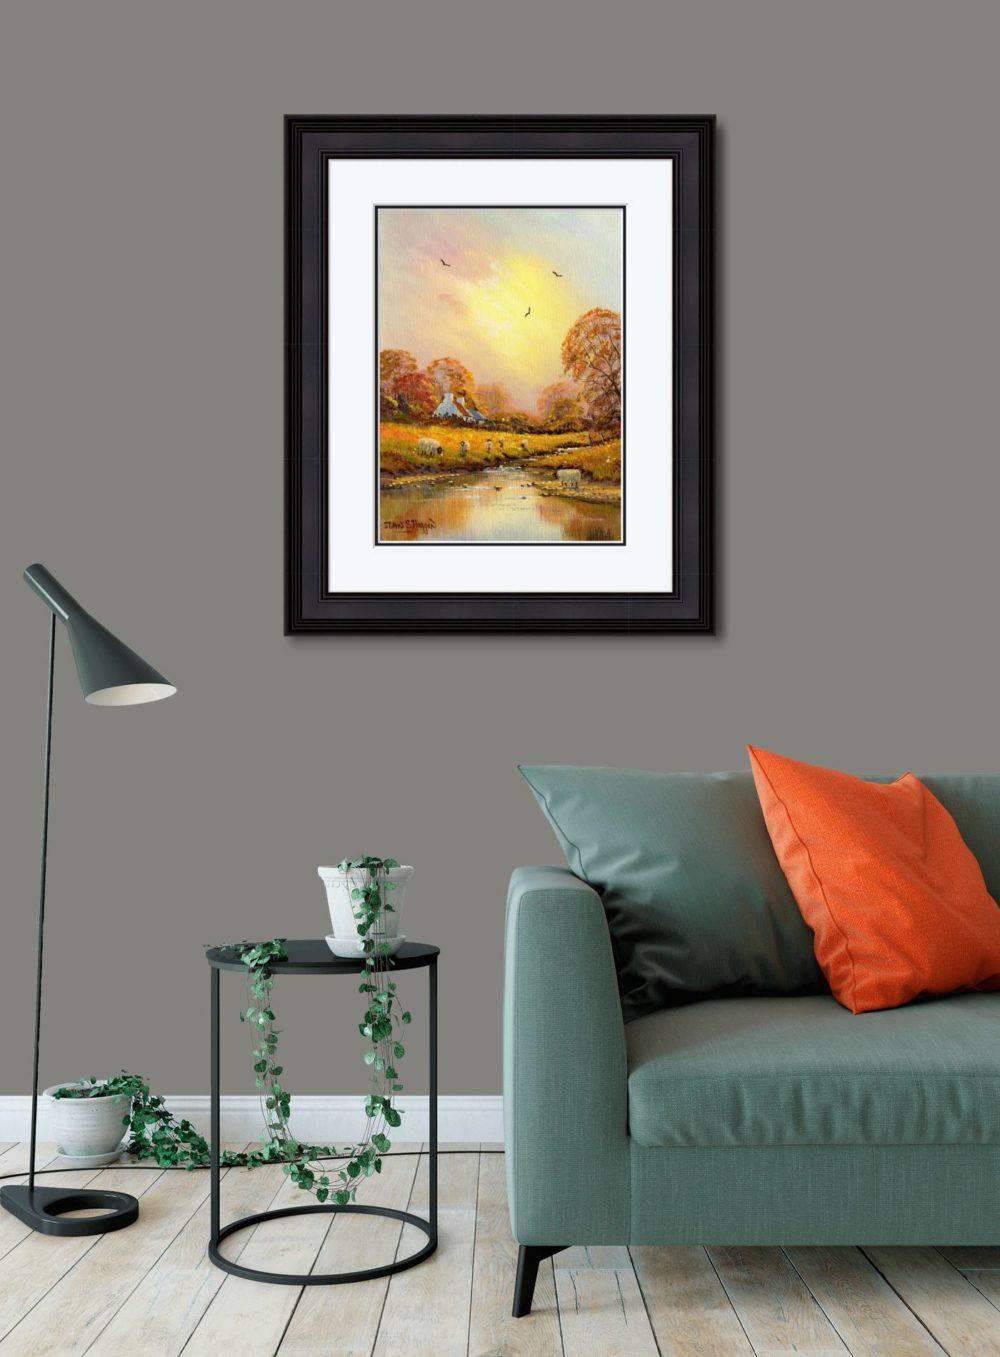 Autumn Stream Print (Large) in Black Frame in Room